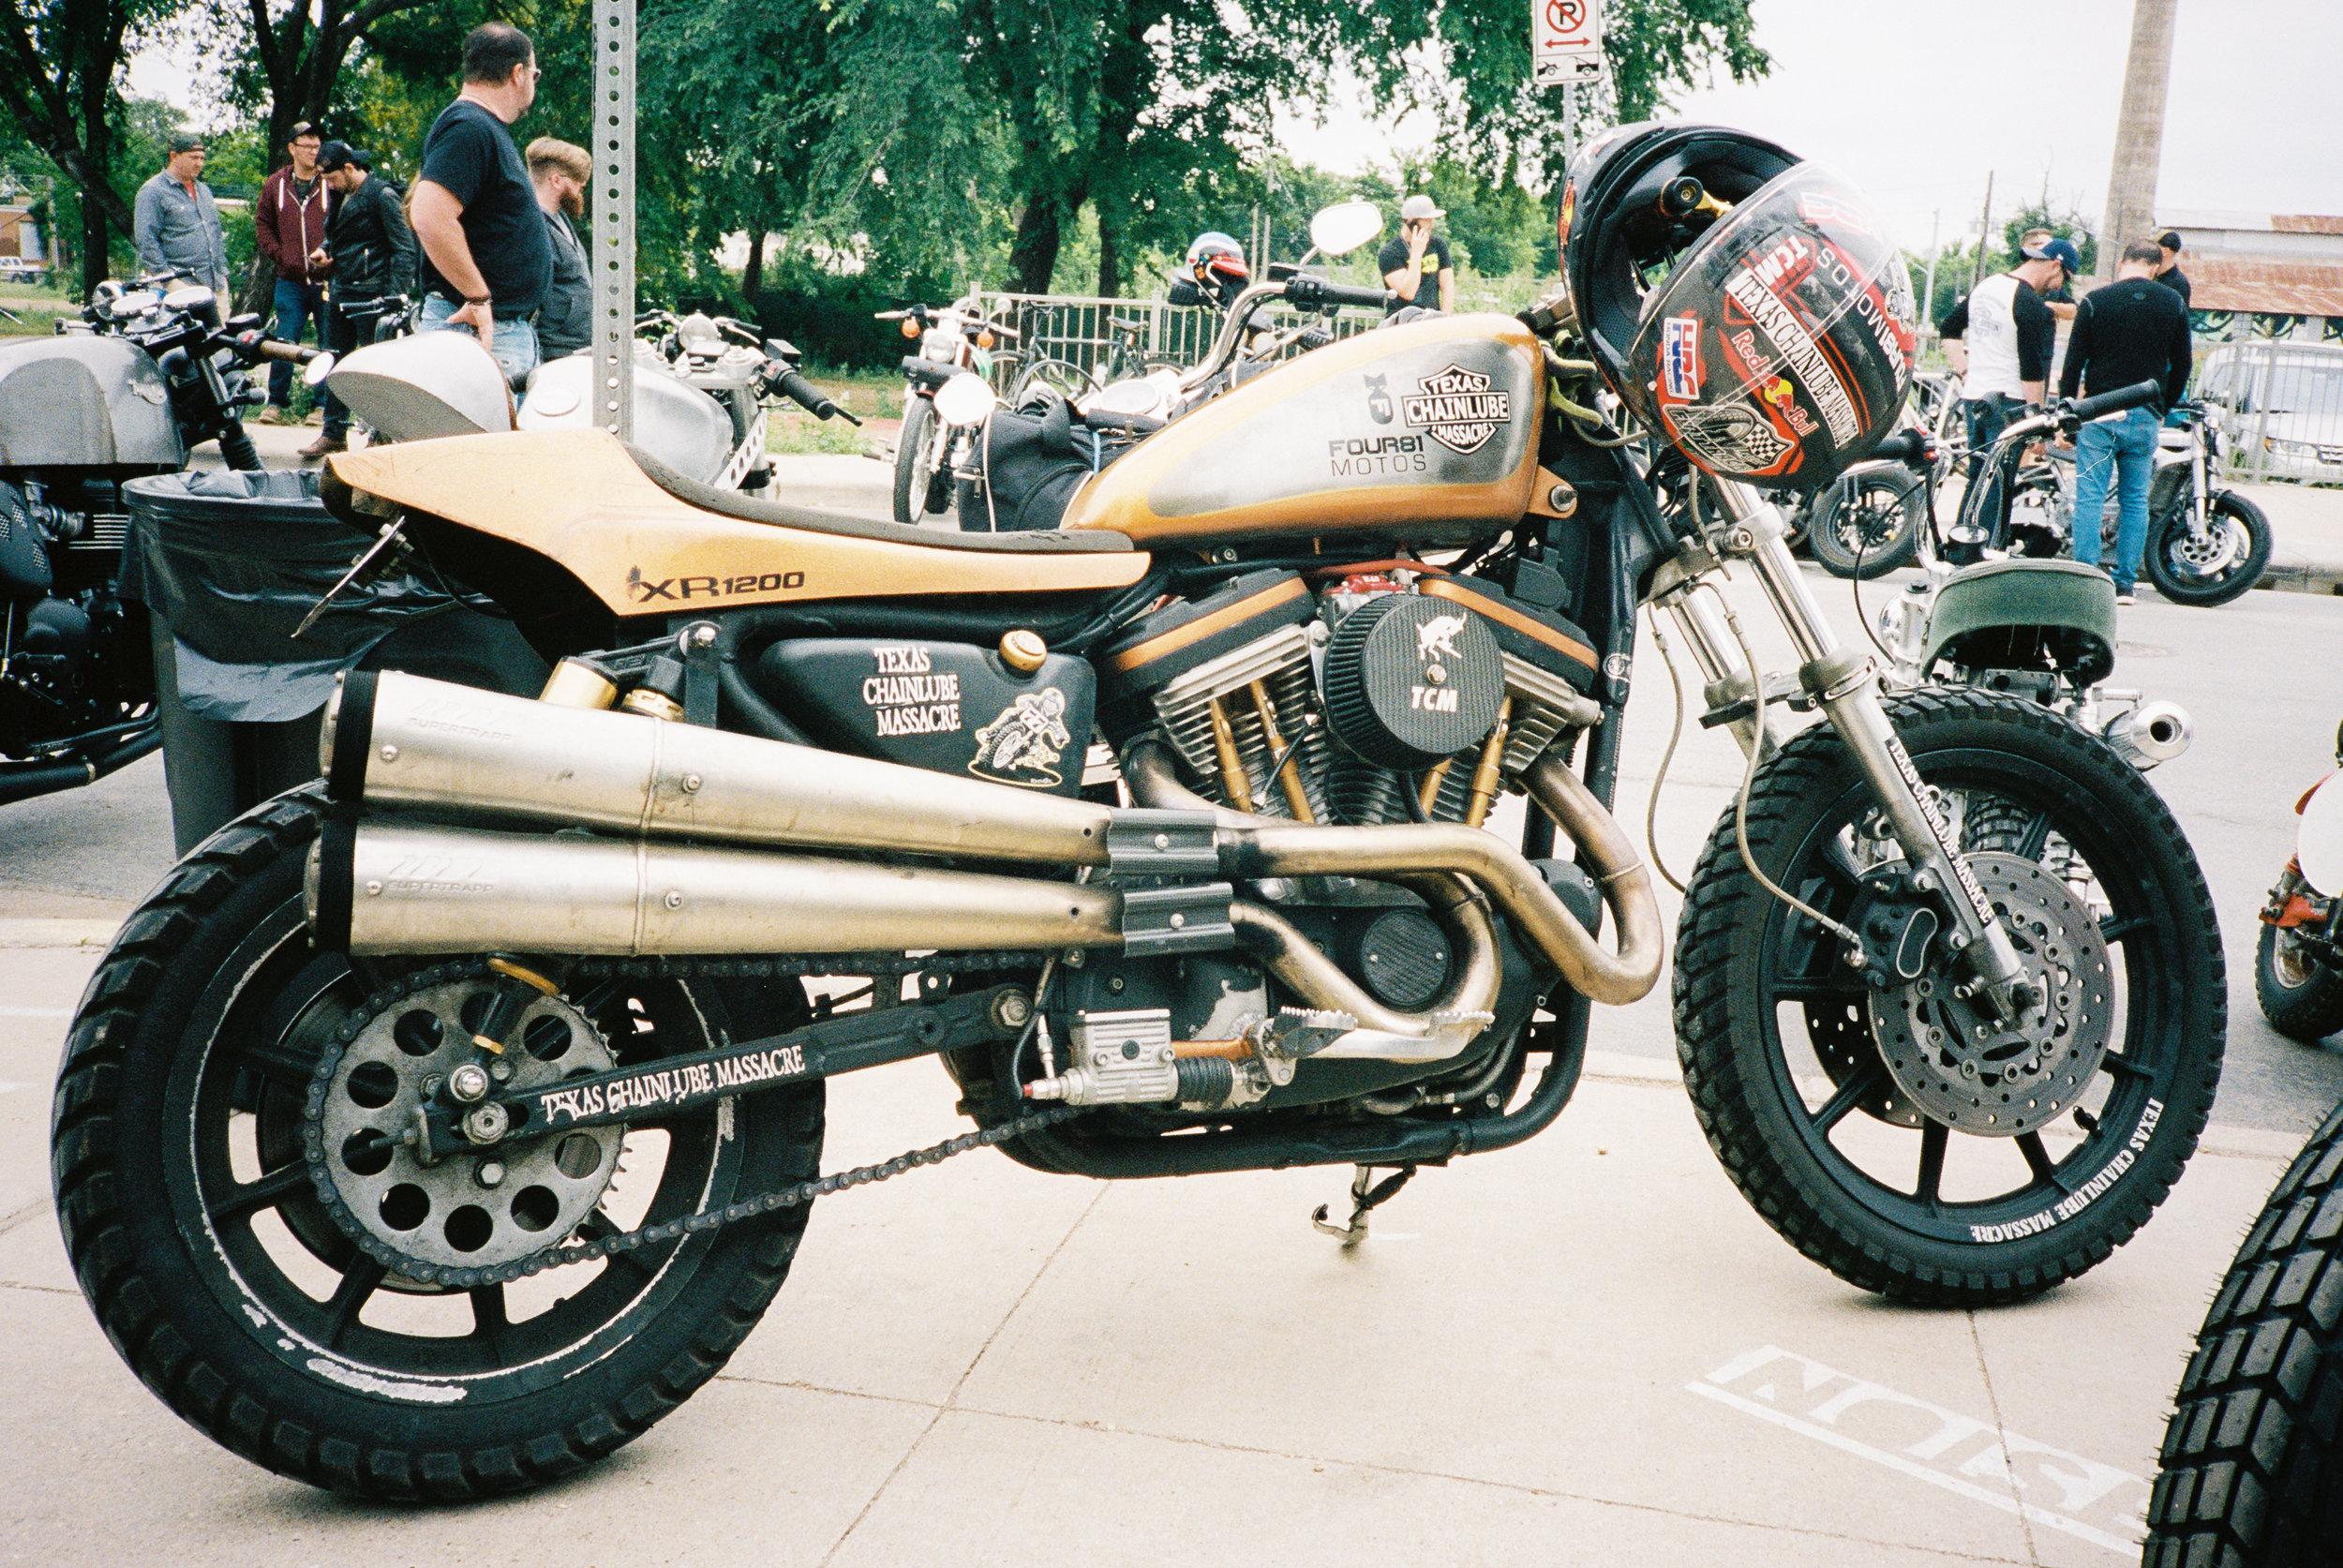 Handbuilt-Motorcycle-Show-2017--19.jpg